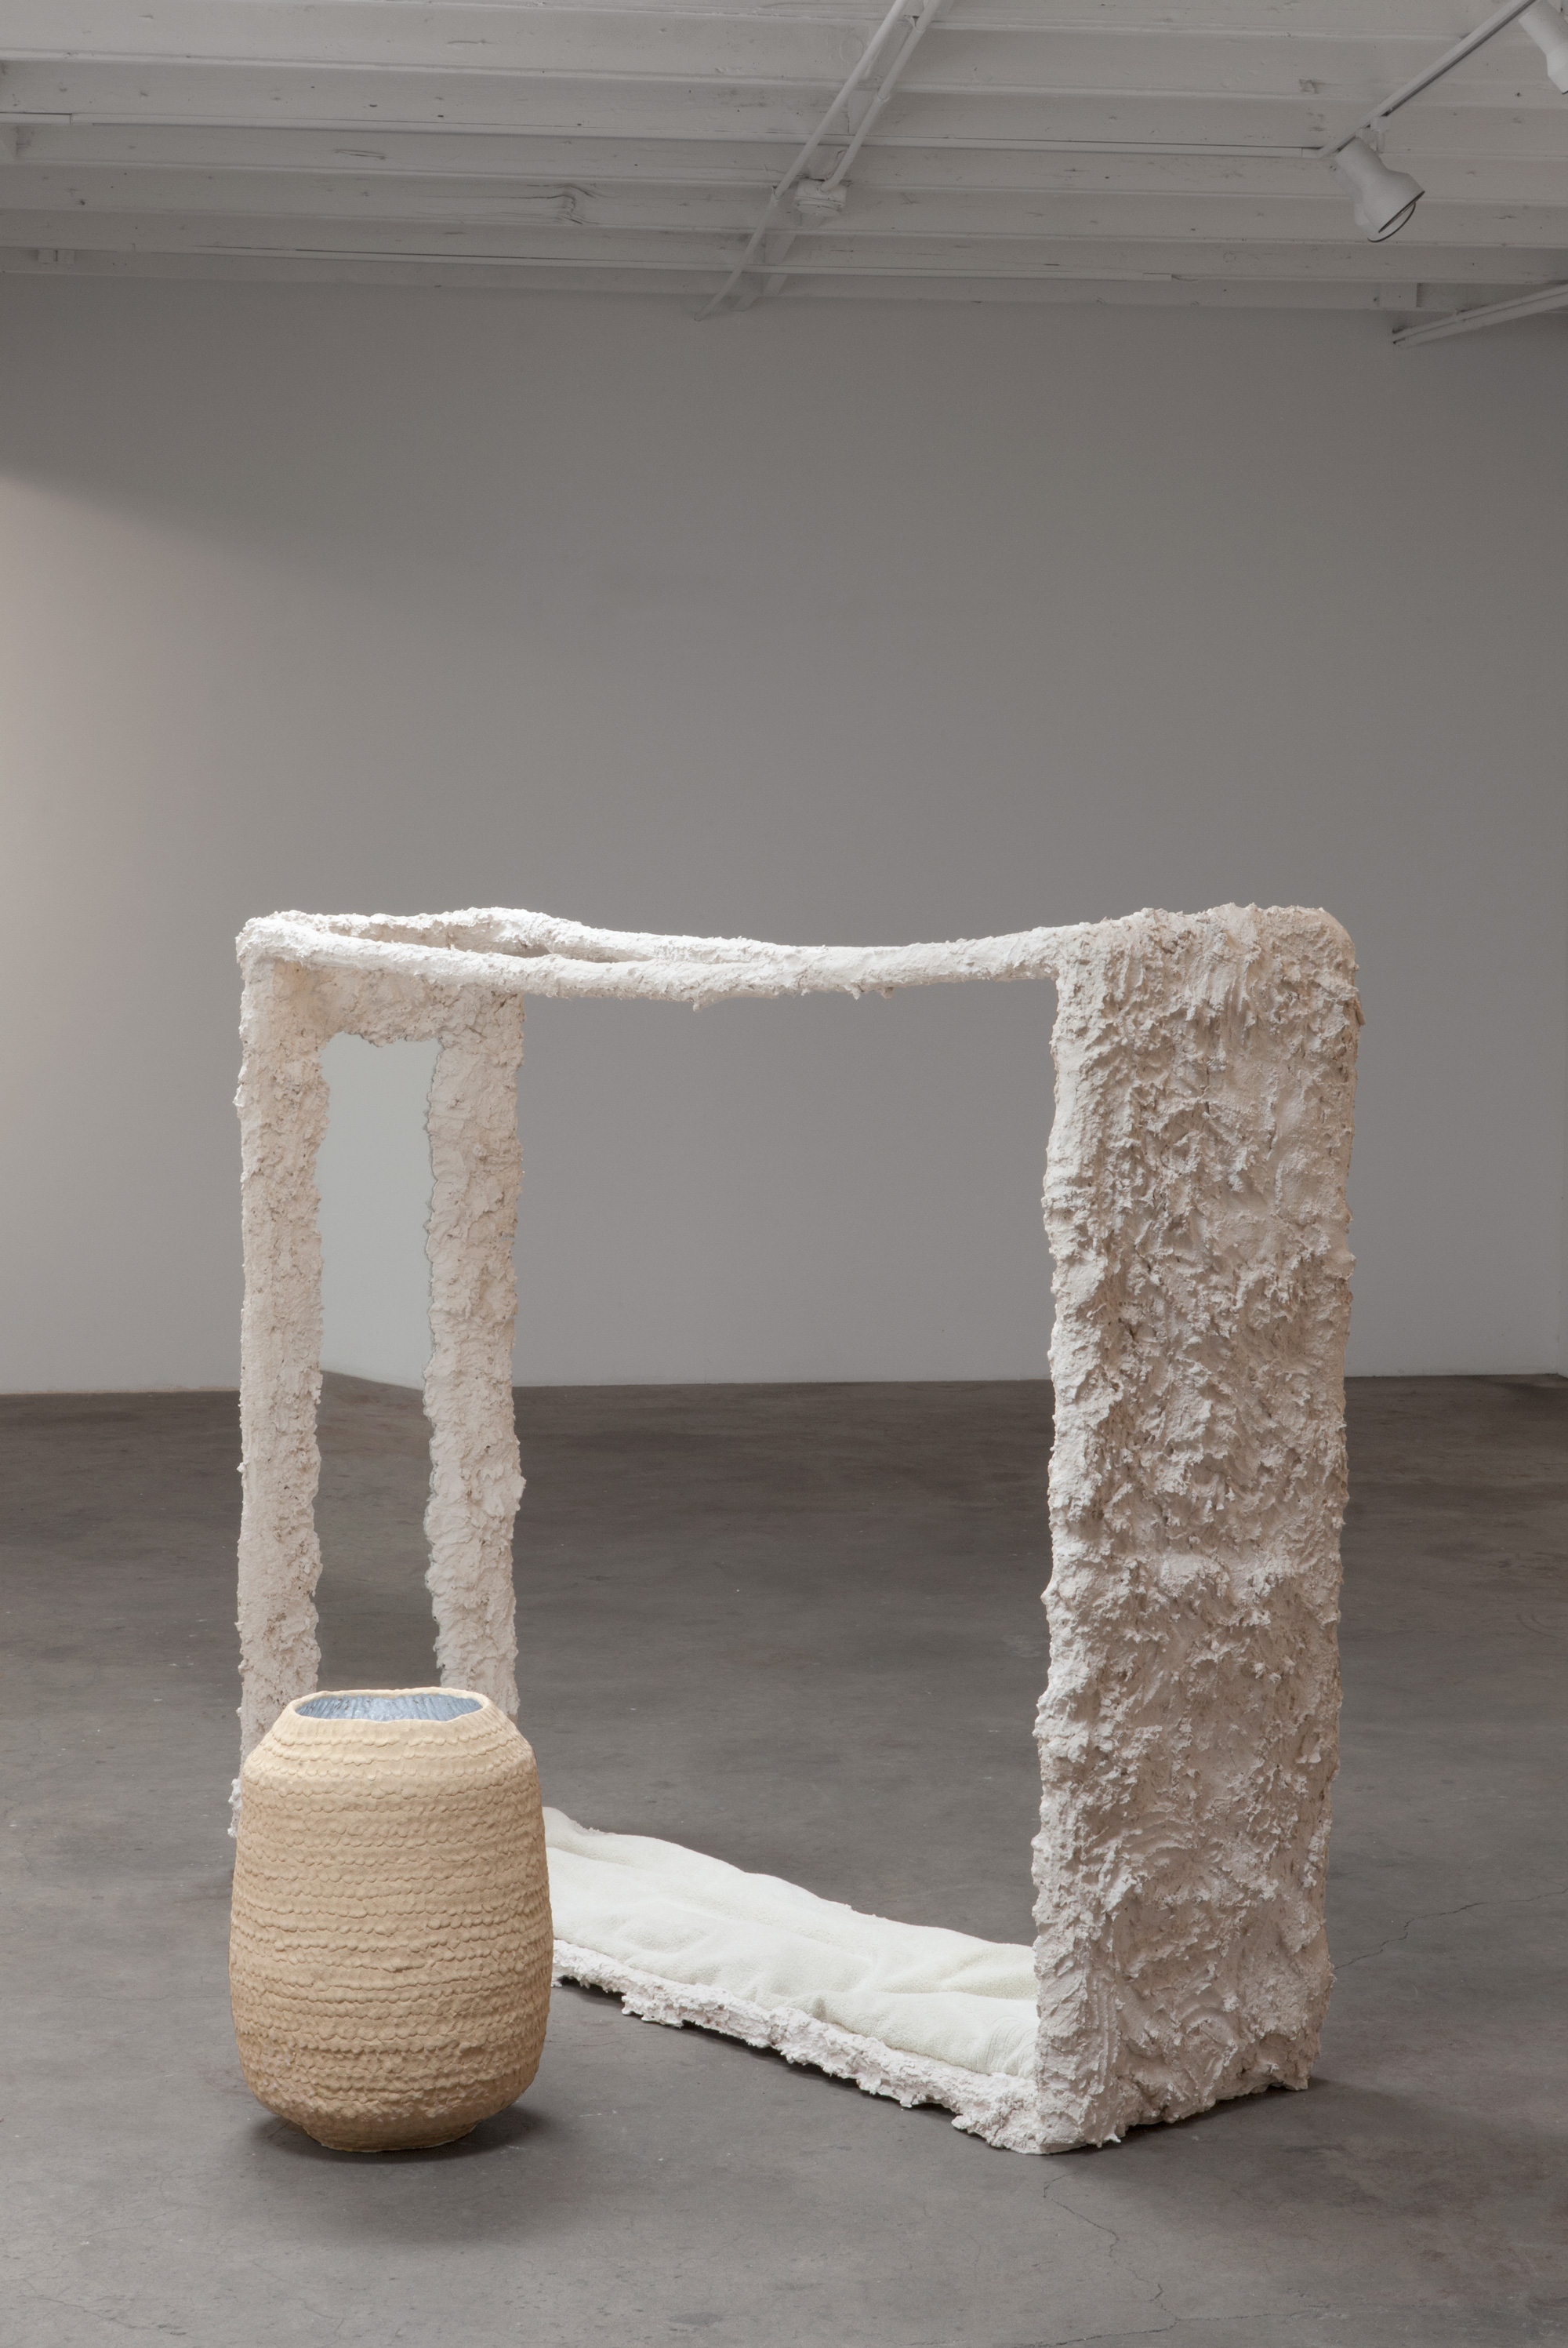 "Kathryn O'Halloran, Infinite Solitude, 2015, plaster, mirror, towel cushion, stoneware, 69"" x 40"" x 55"""